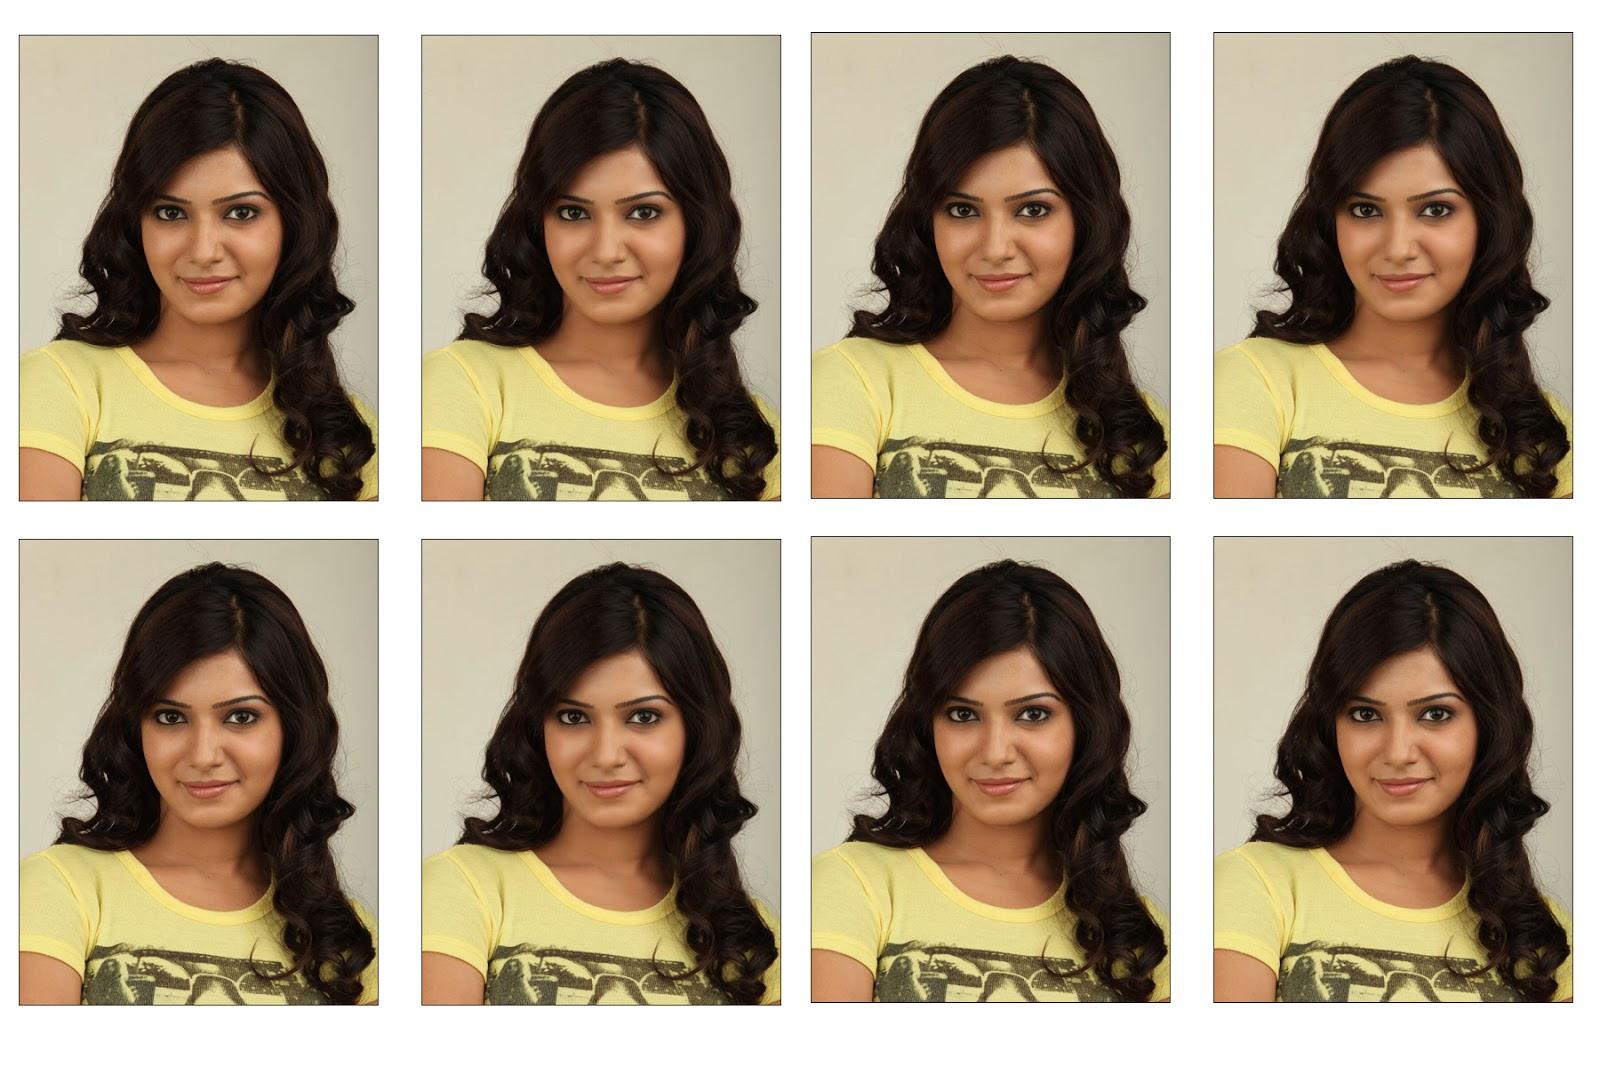 Making of 8 passport size photos in single maxi - StudywithDemo